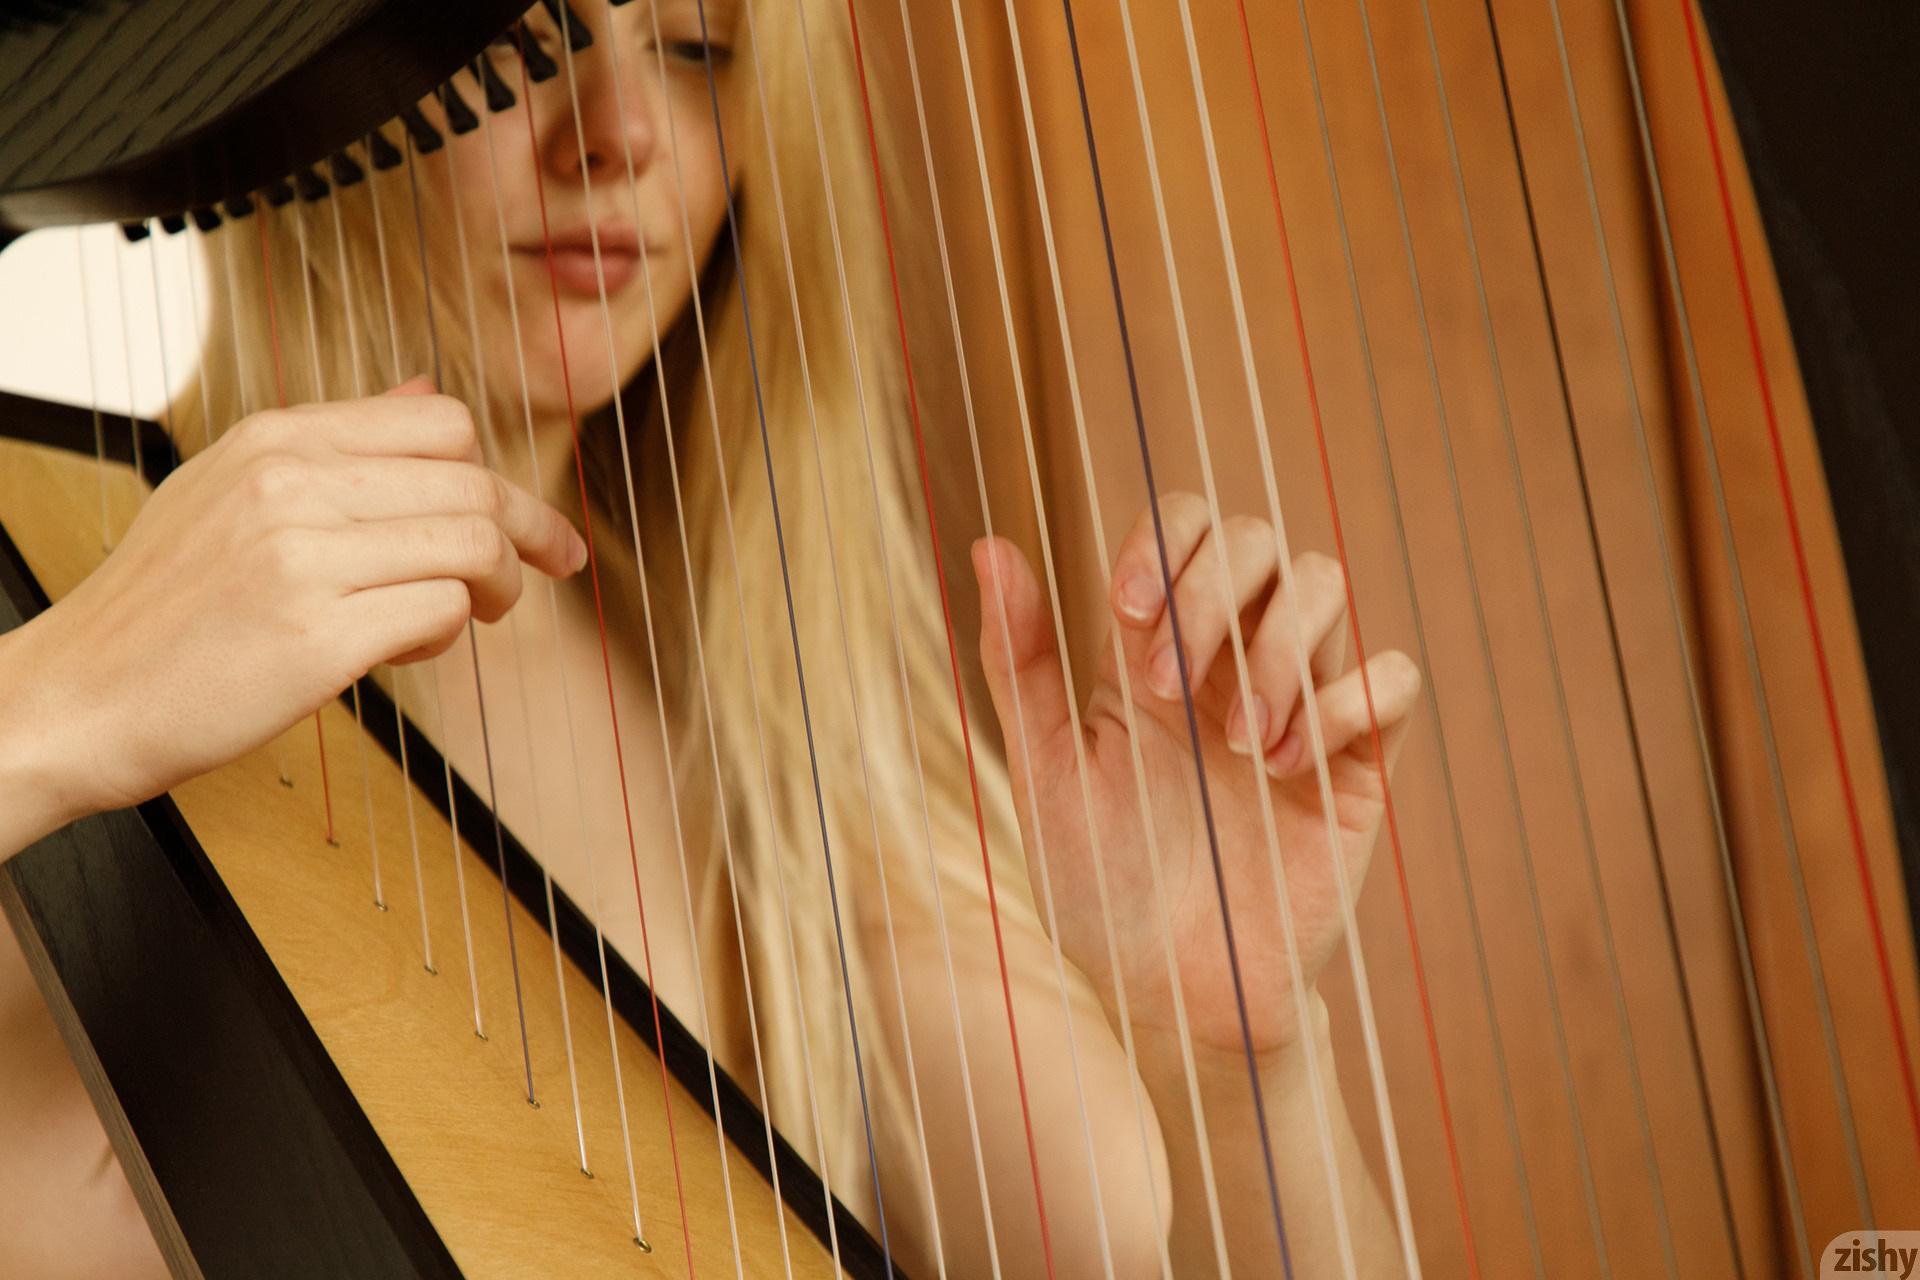 Helen Bergstrom Show Me Your Strings Zishy (20)